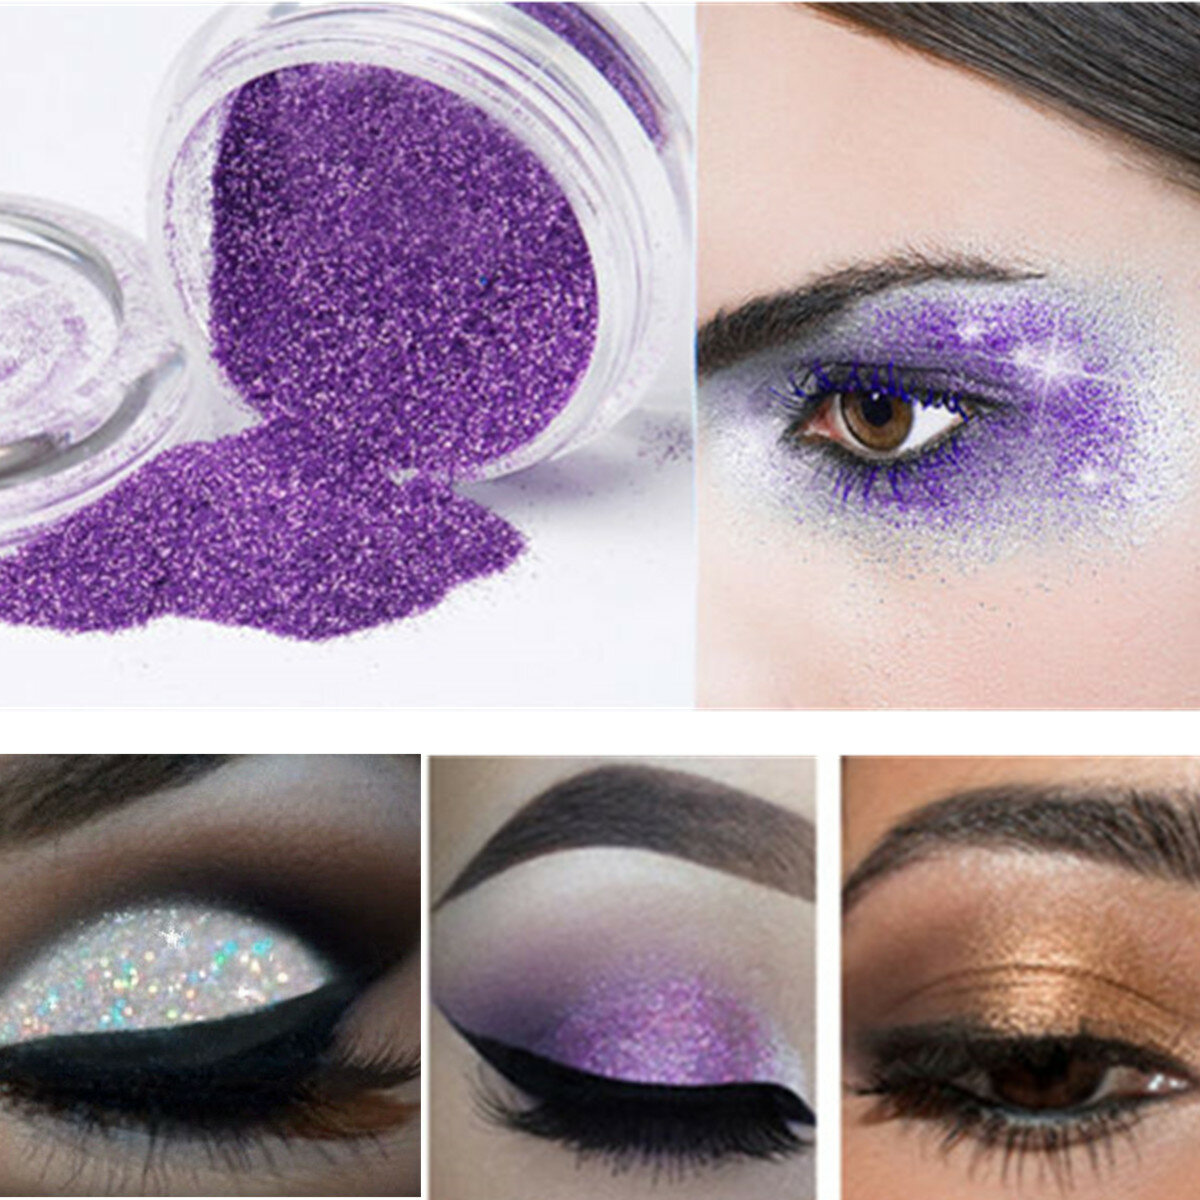 Nail Decoration Makeup Loose Powder Glitter Profession Eyeshadow Beauty Eye Shadow Pigment